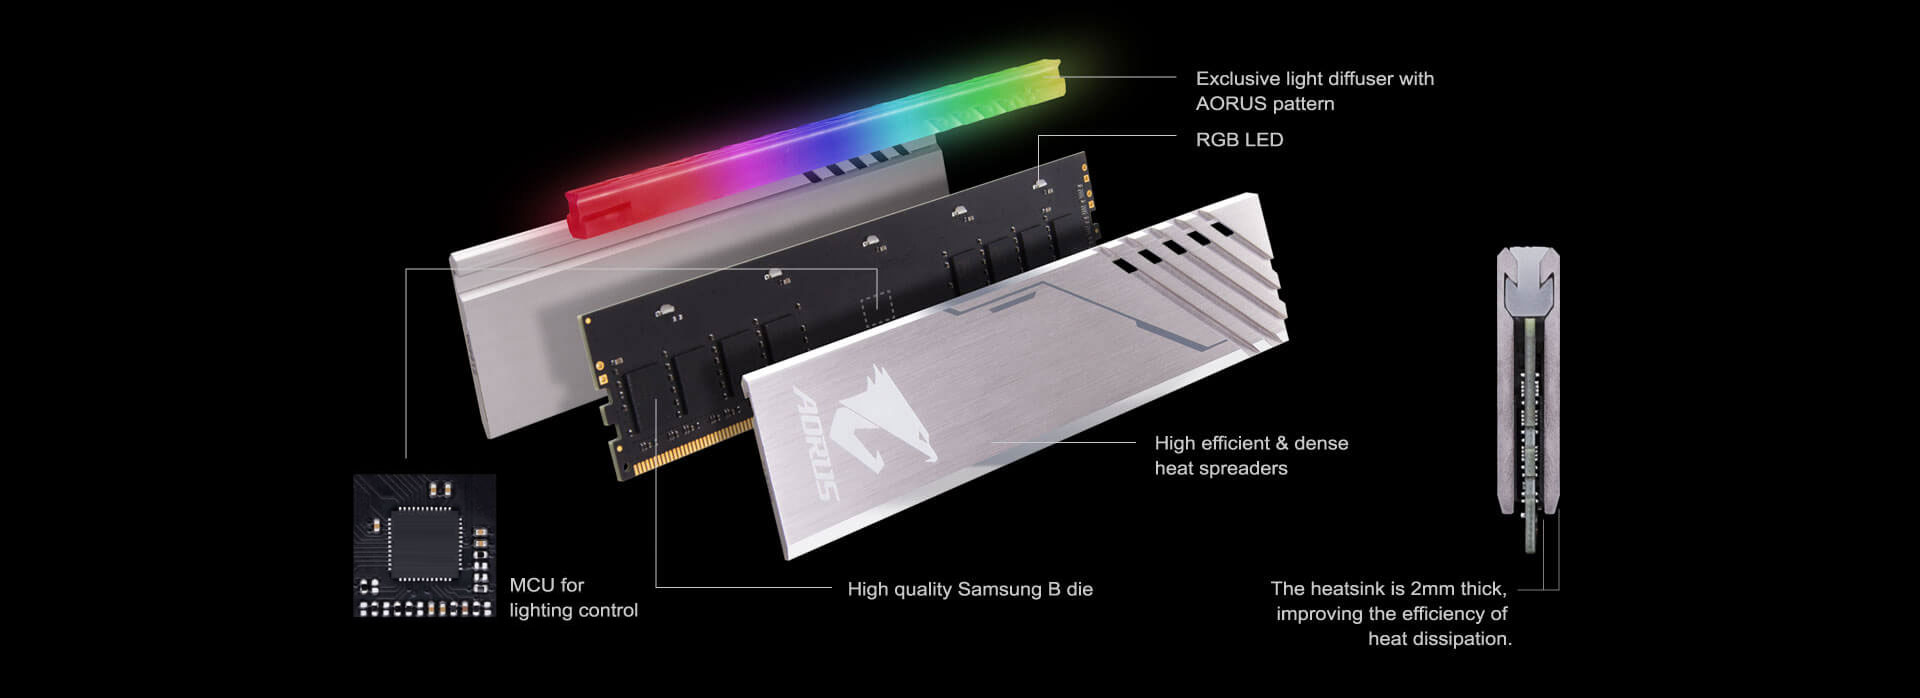 AORUS RGB Memory 16GB (2x8GB) 3200MHz (With Demo Kit ... on